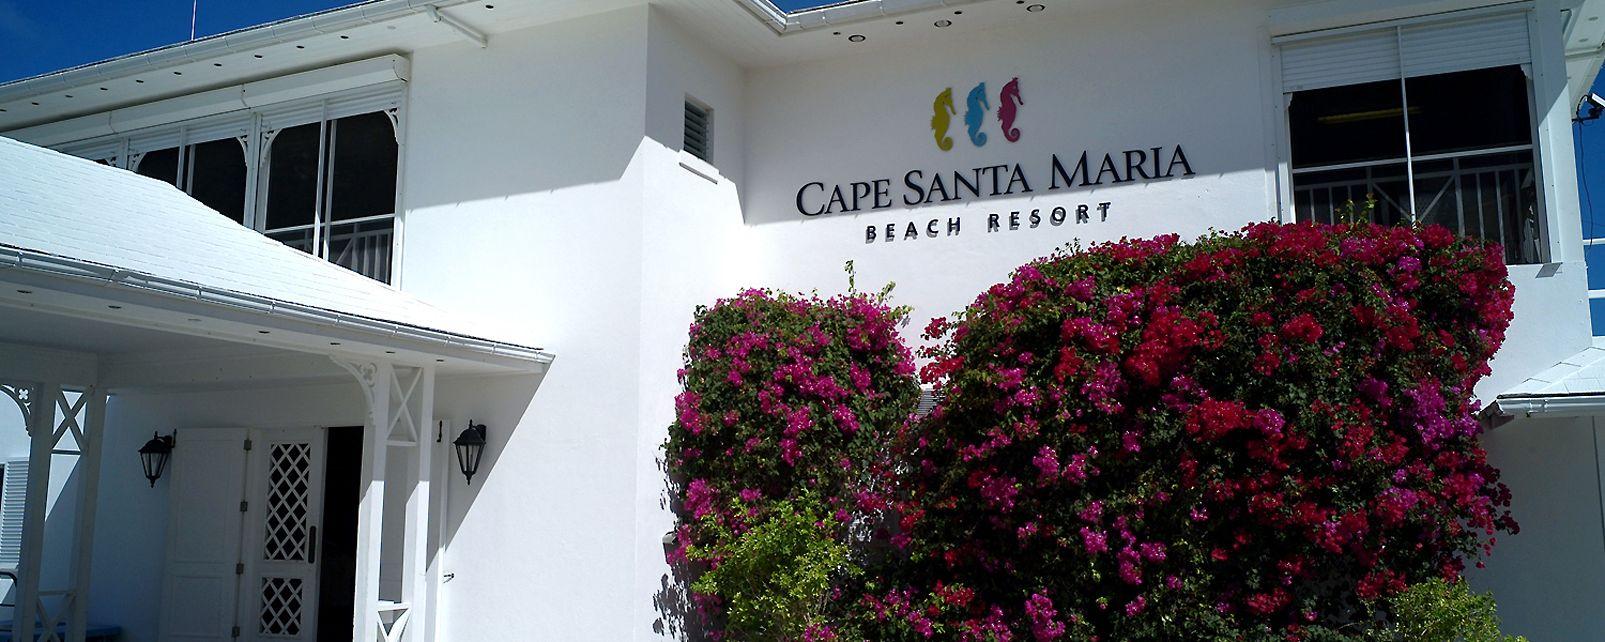 Hotel Cape Santa Maria Resort